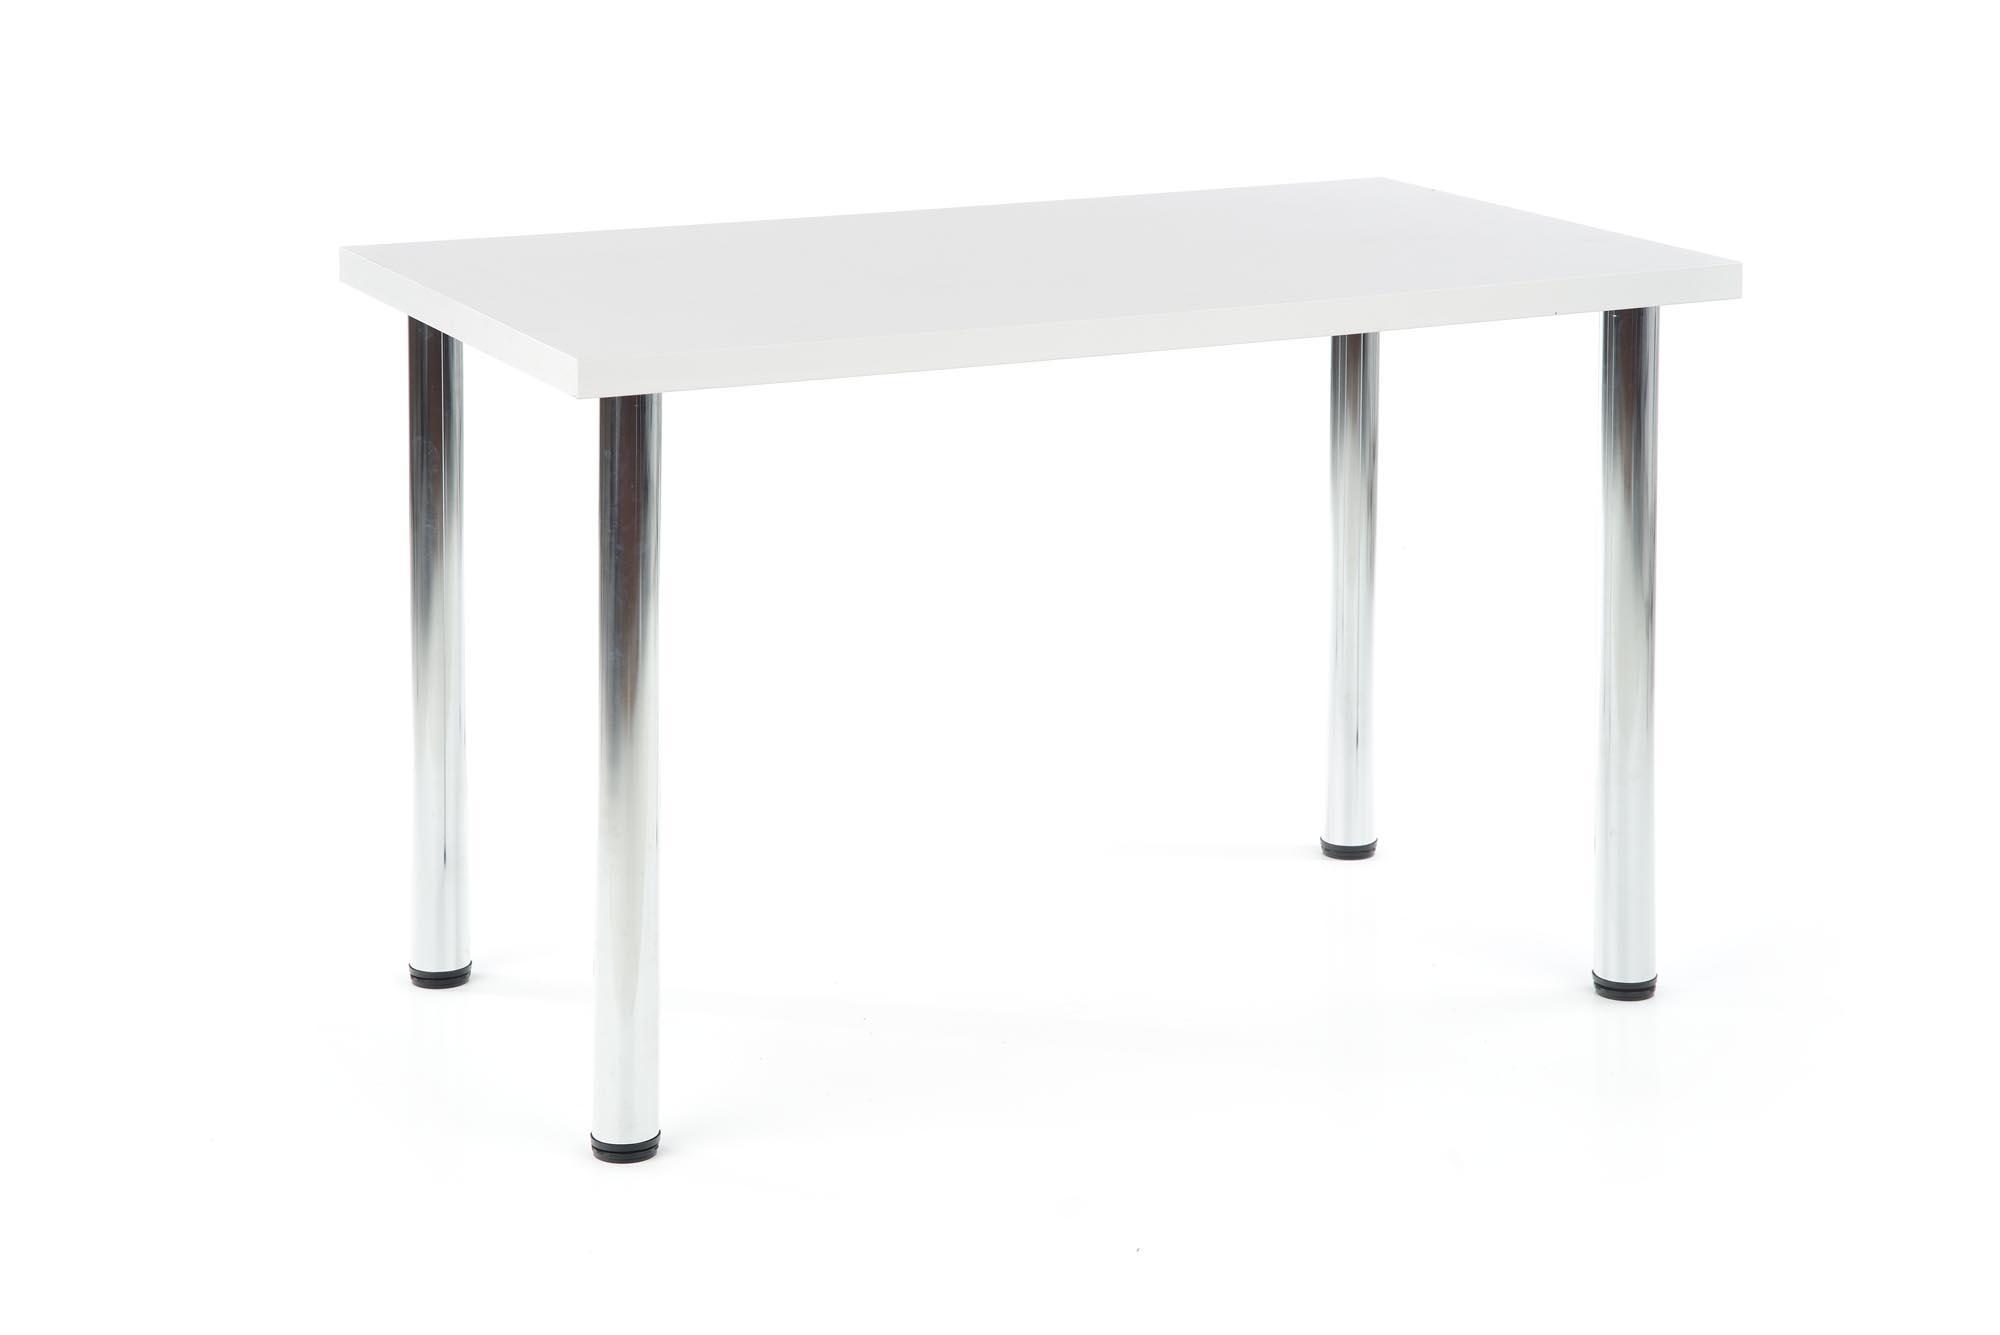 MODEX 120 stół kolor blat - biały, nogi - chrom (2p=1szt)